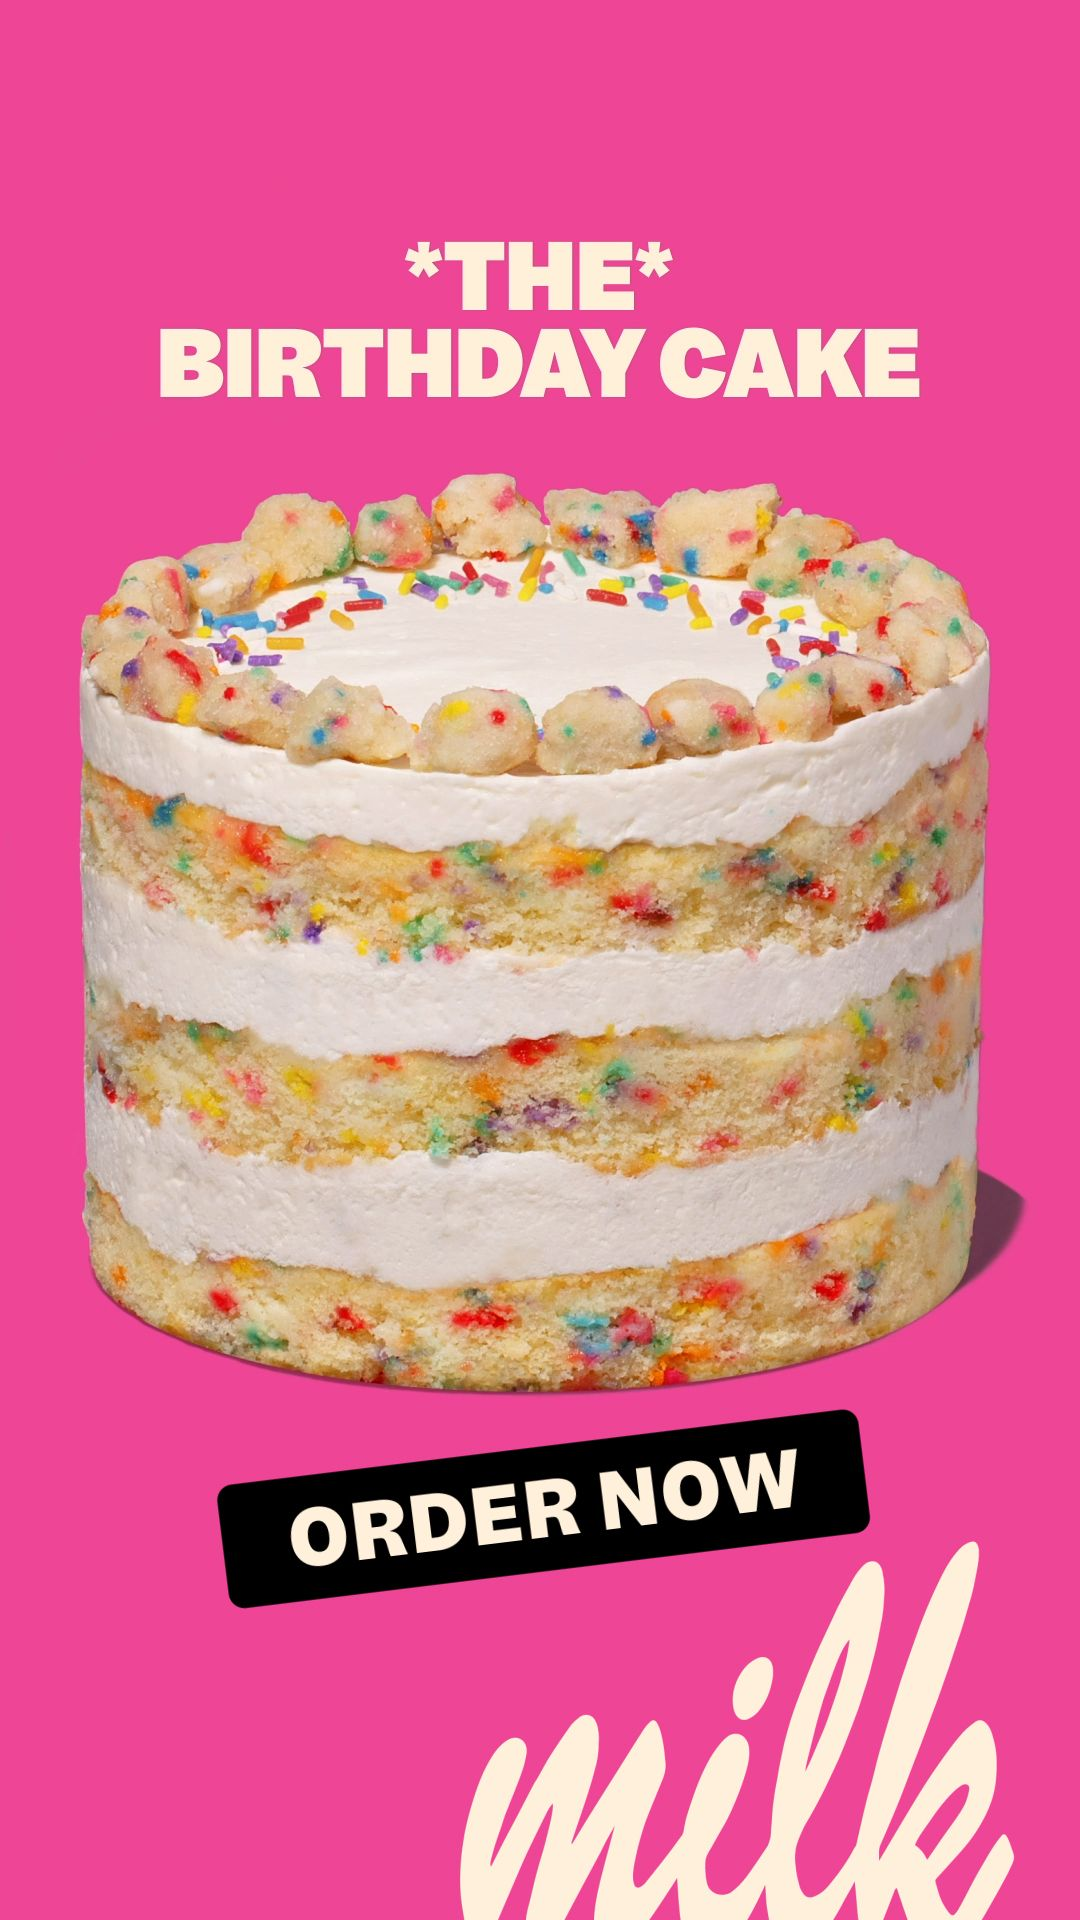 Birthday cake delicious desserts cake desserts